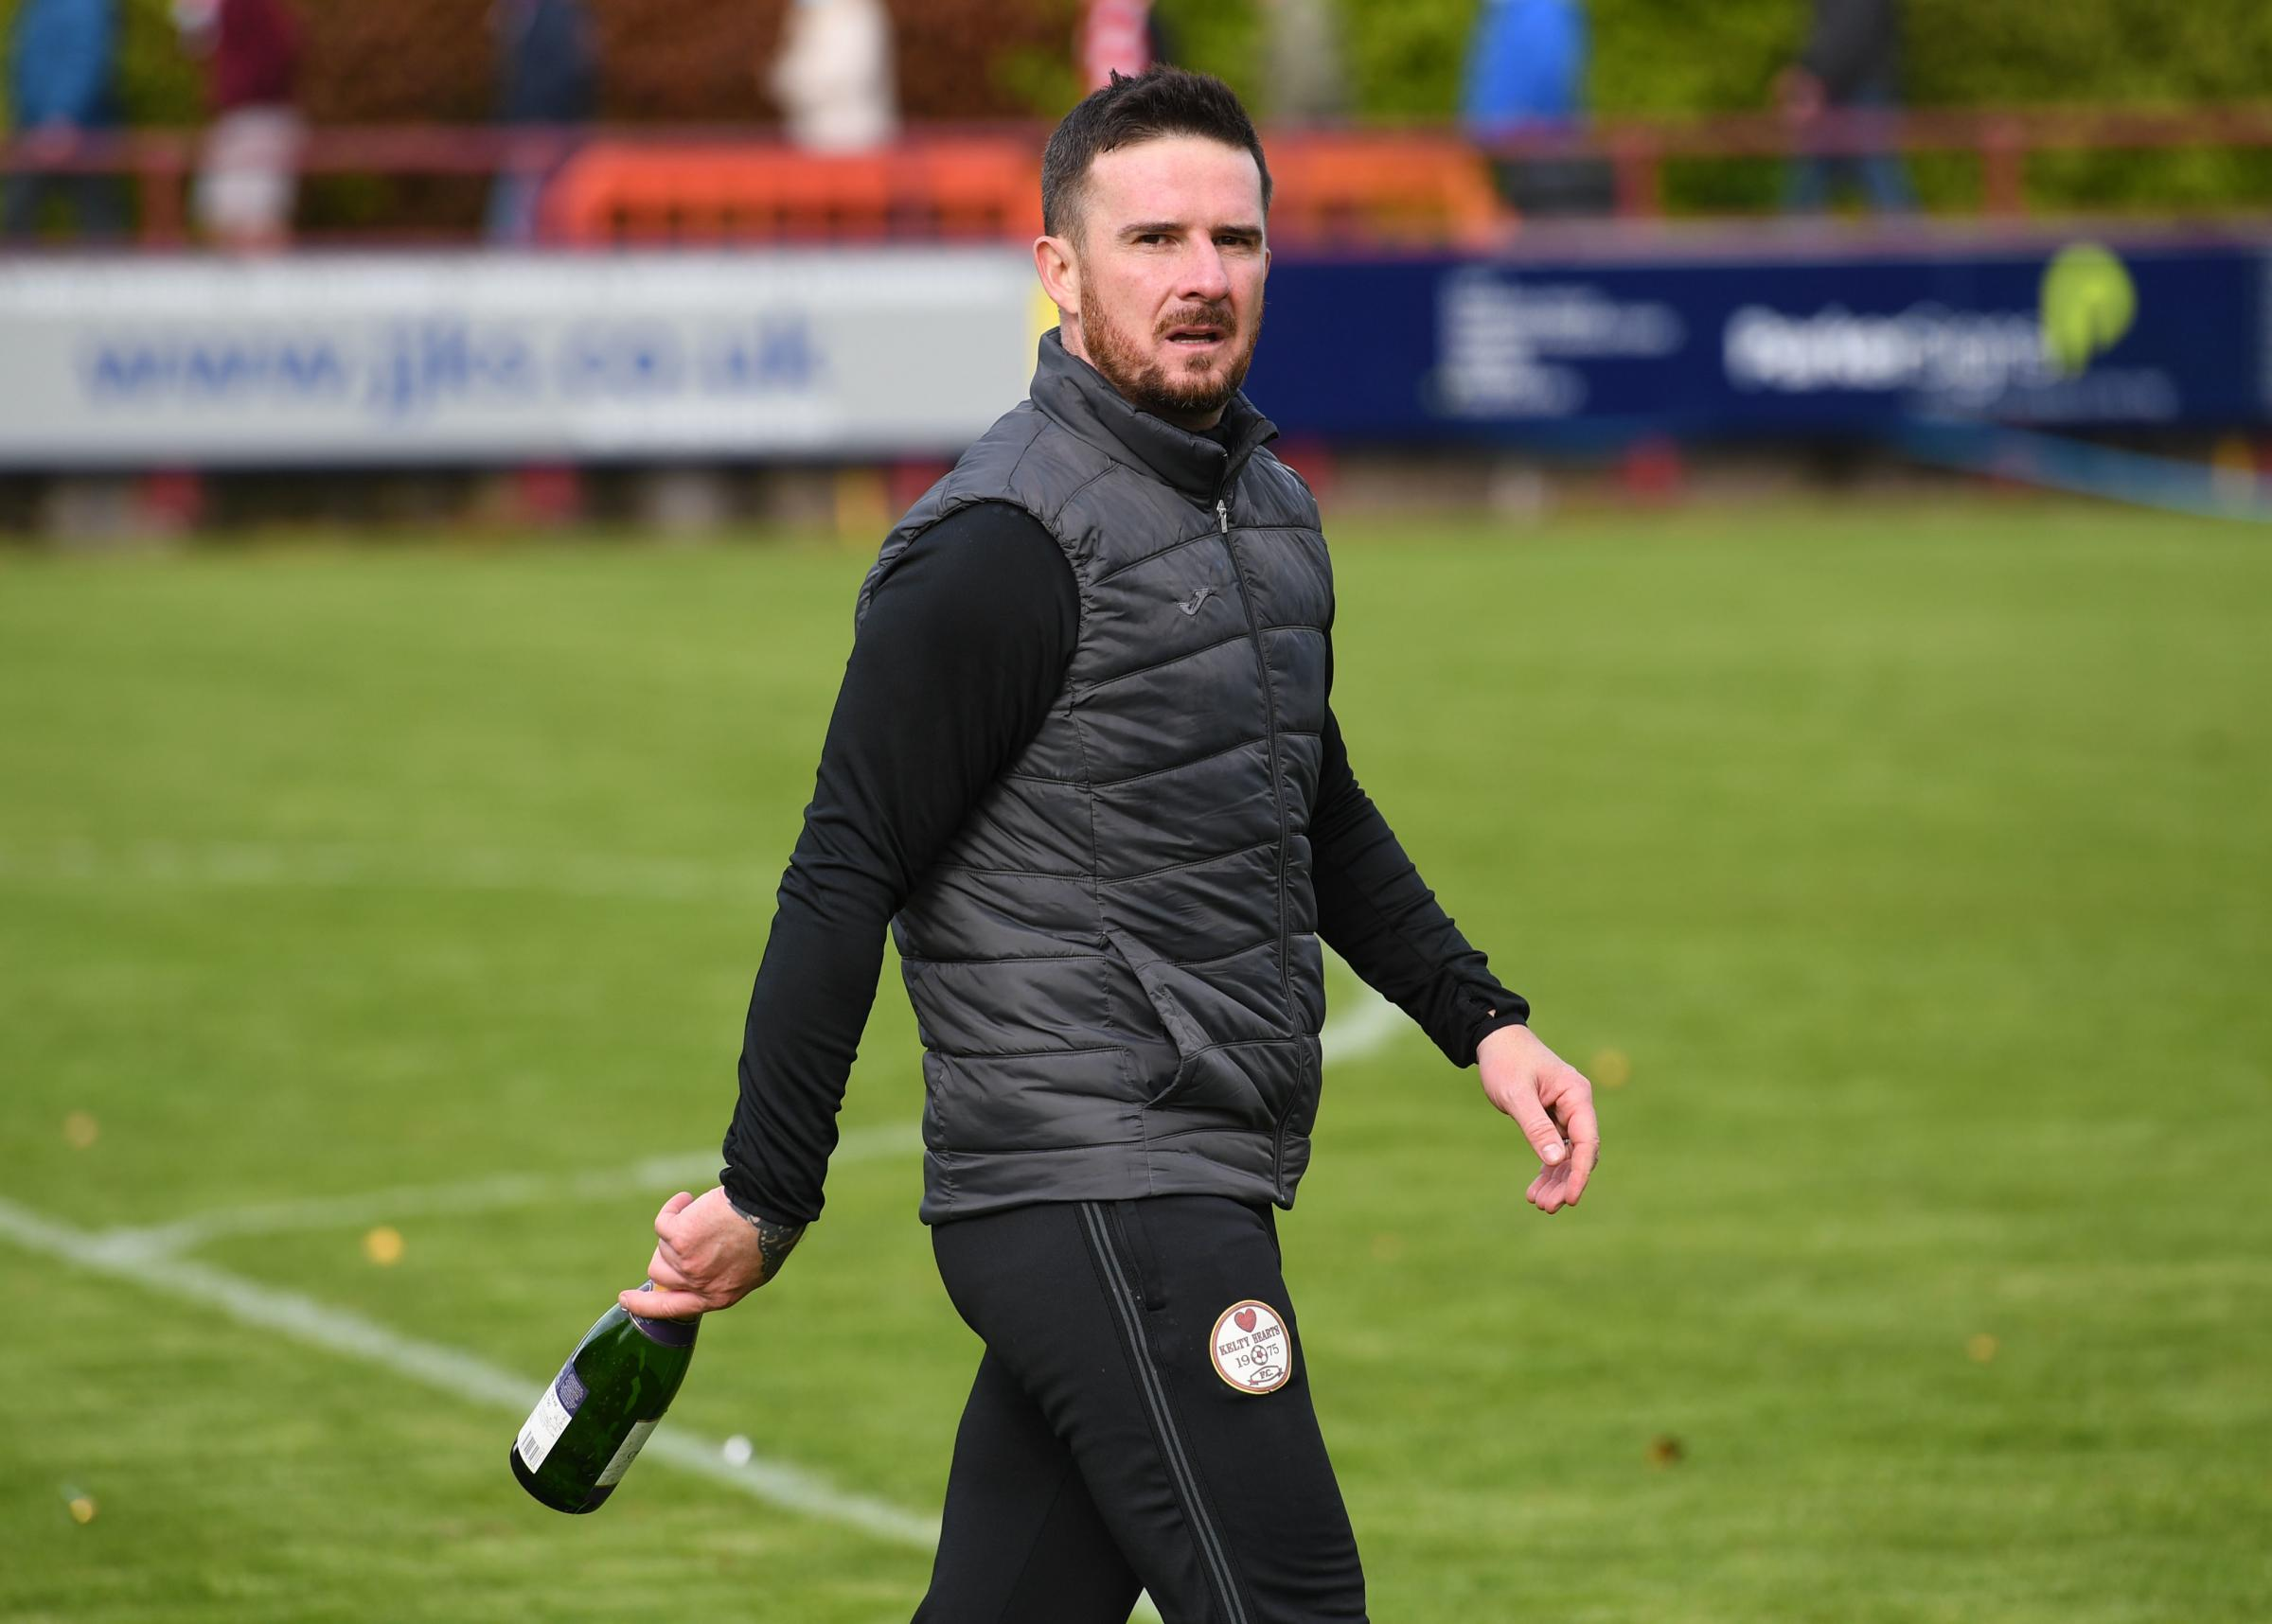 Rangers legend Barry Ferguson ready for whirlwind start as Alloa boss